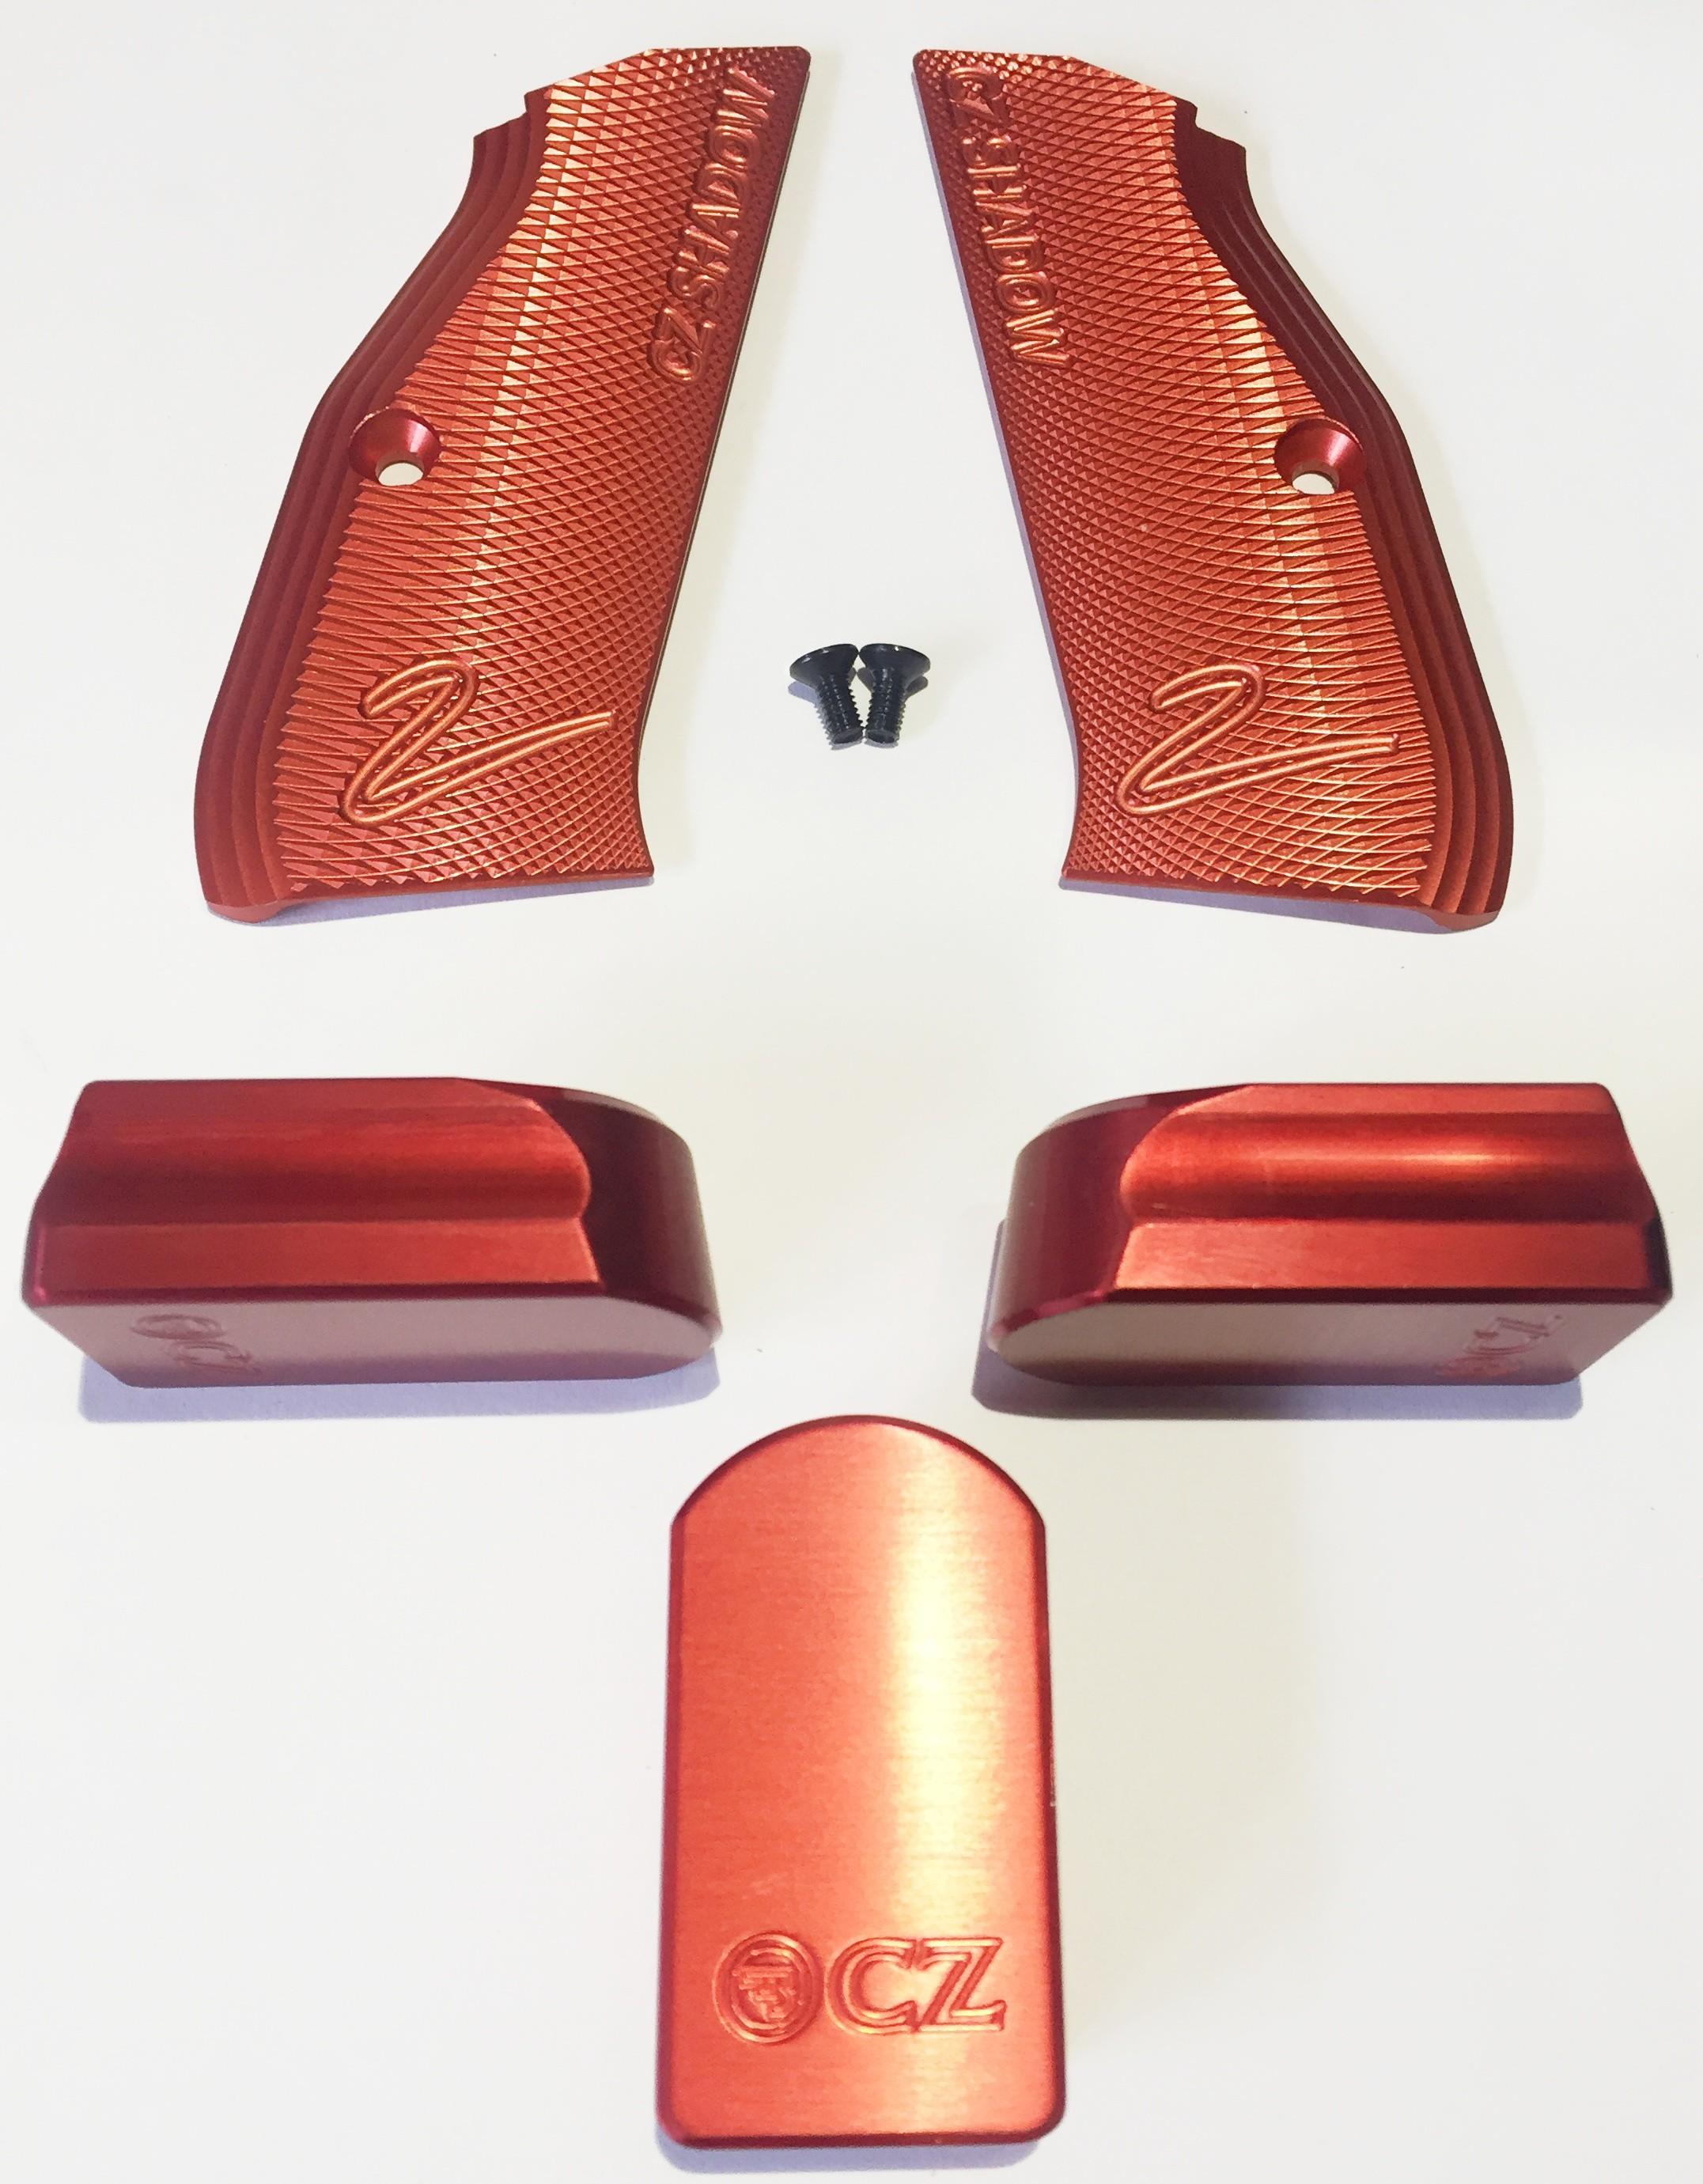 Aluminium magazine release - Seboweapons com - prodej zbraní